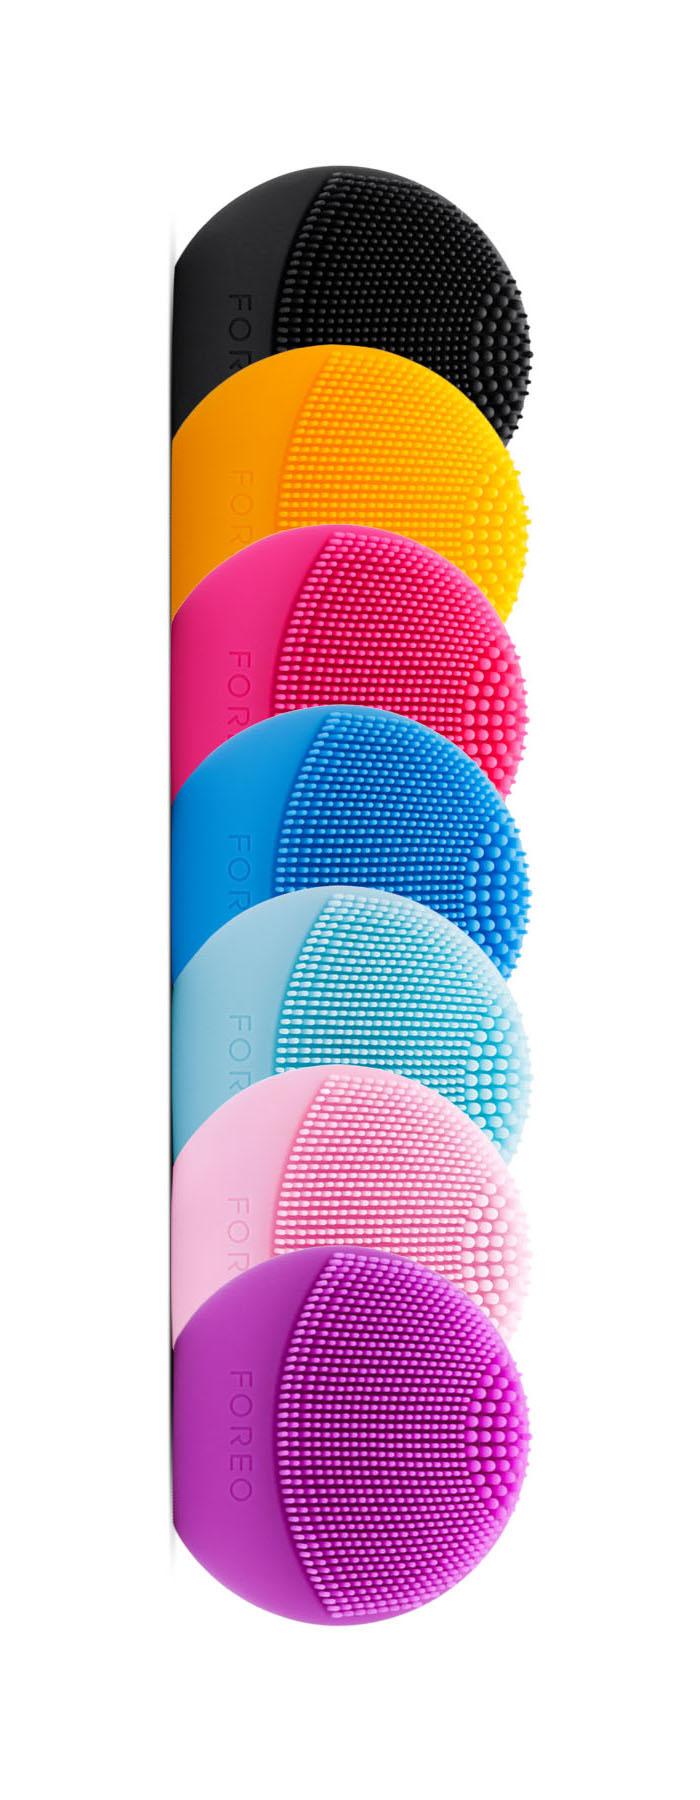 brosse nettoyante petit prix